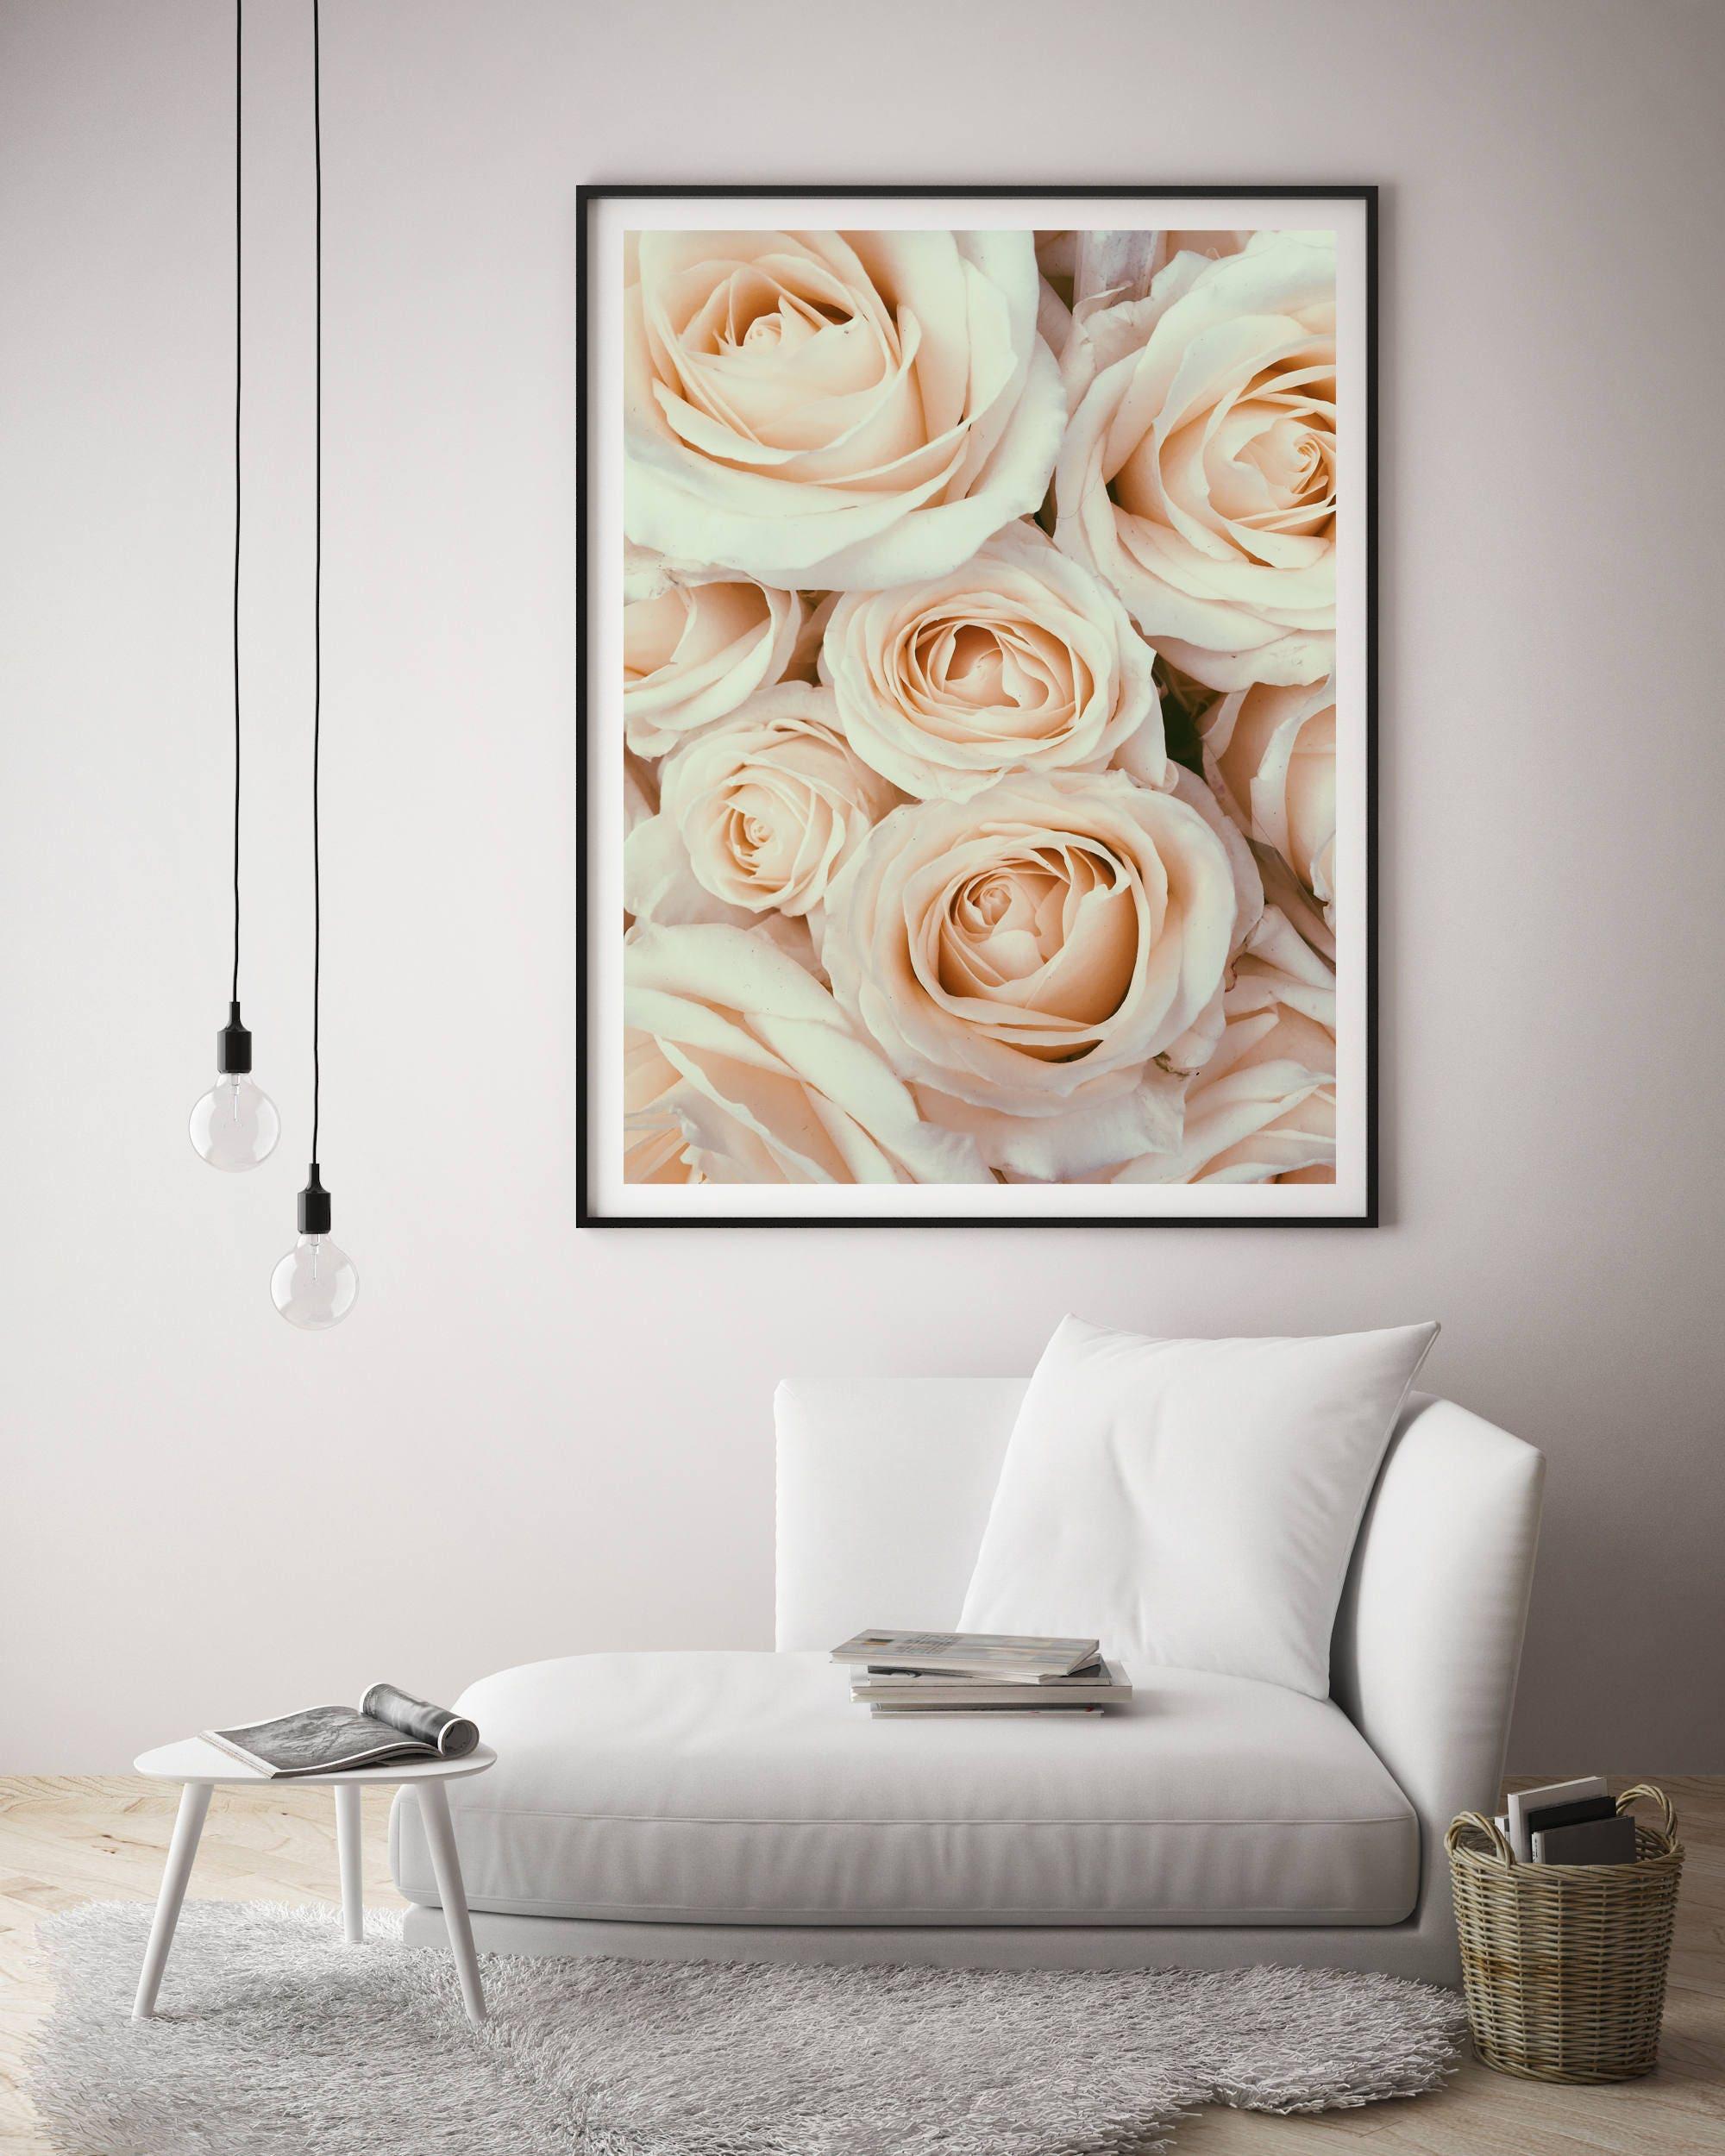 spoon hanging rose youtube plastic decor wall diy wreath jessica watch house joaquin flower